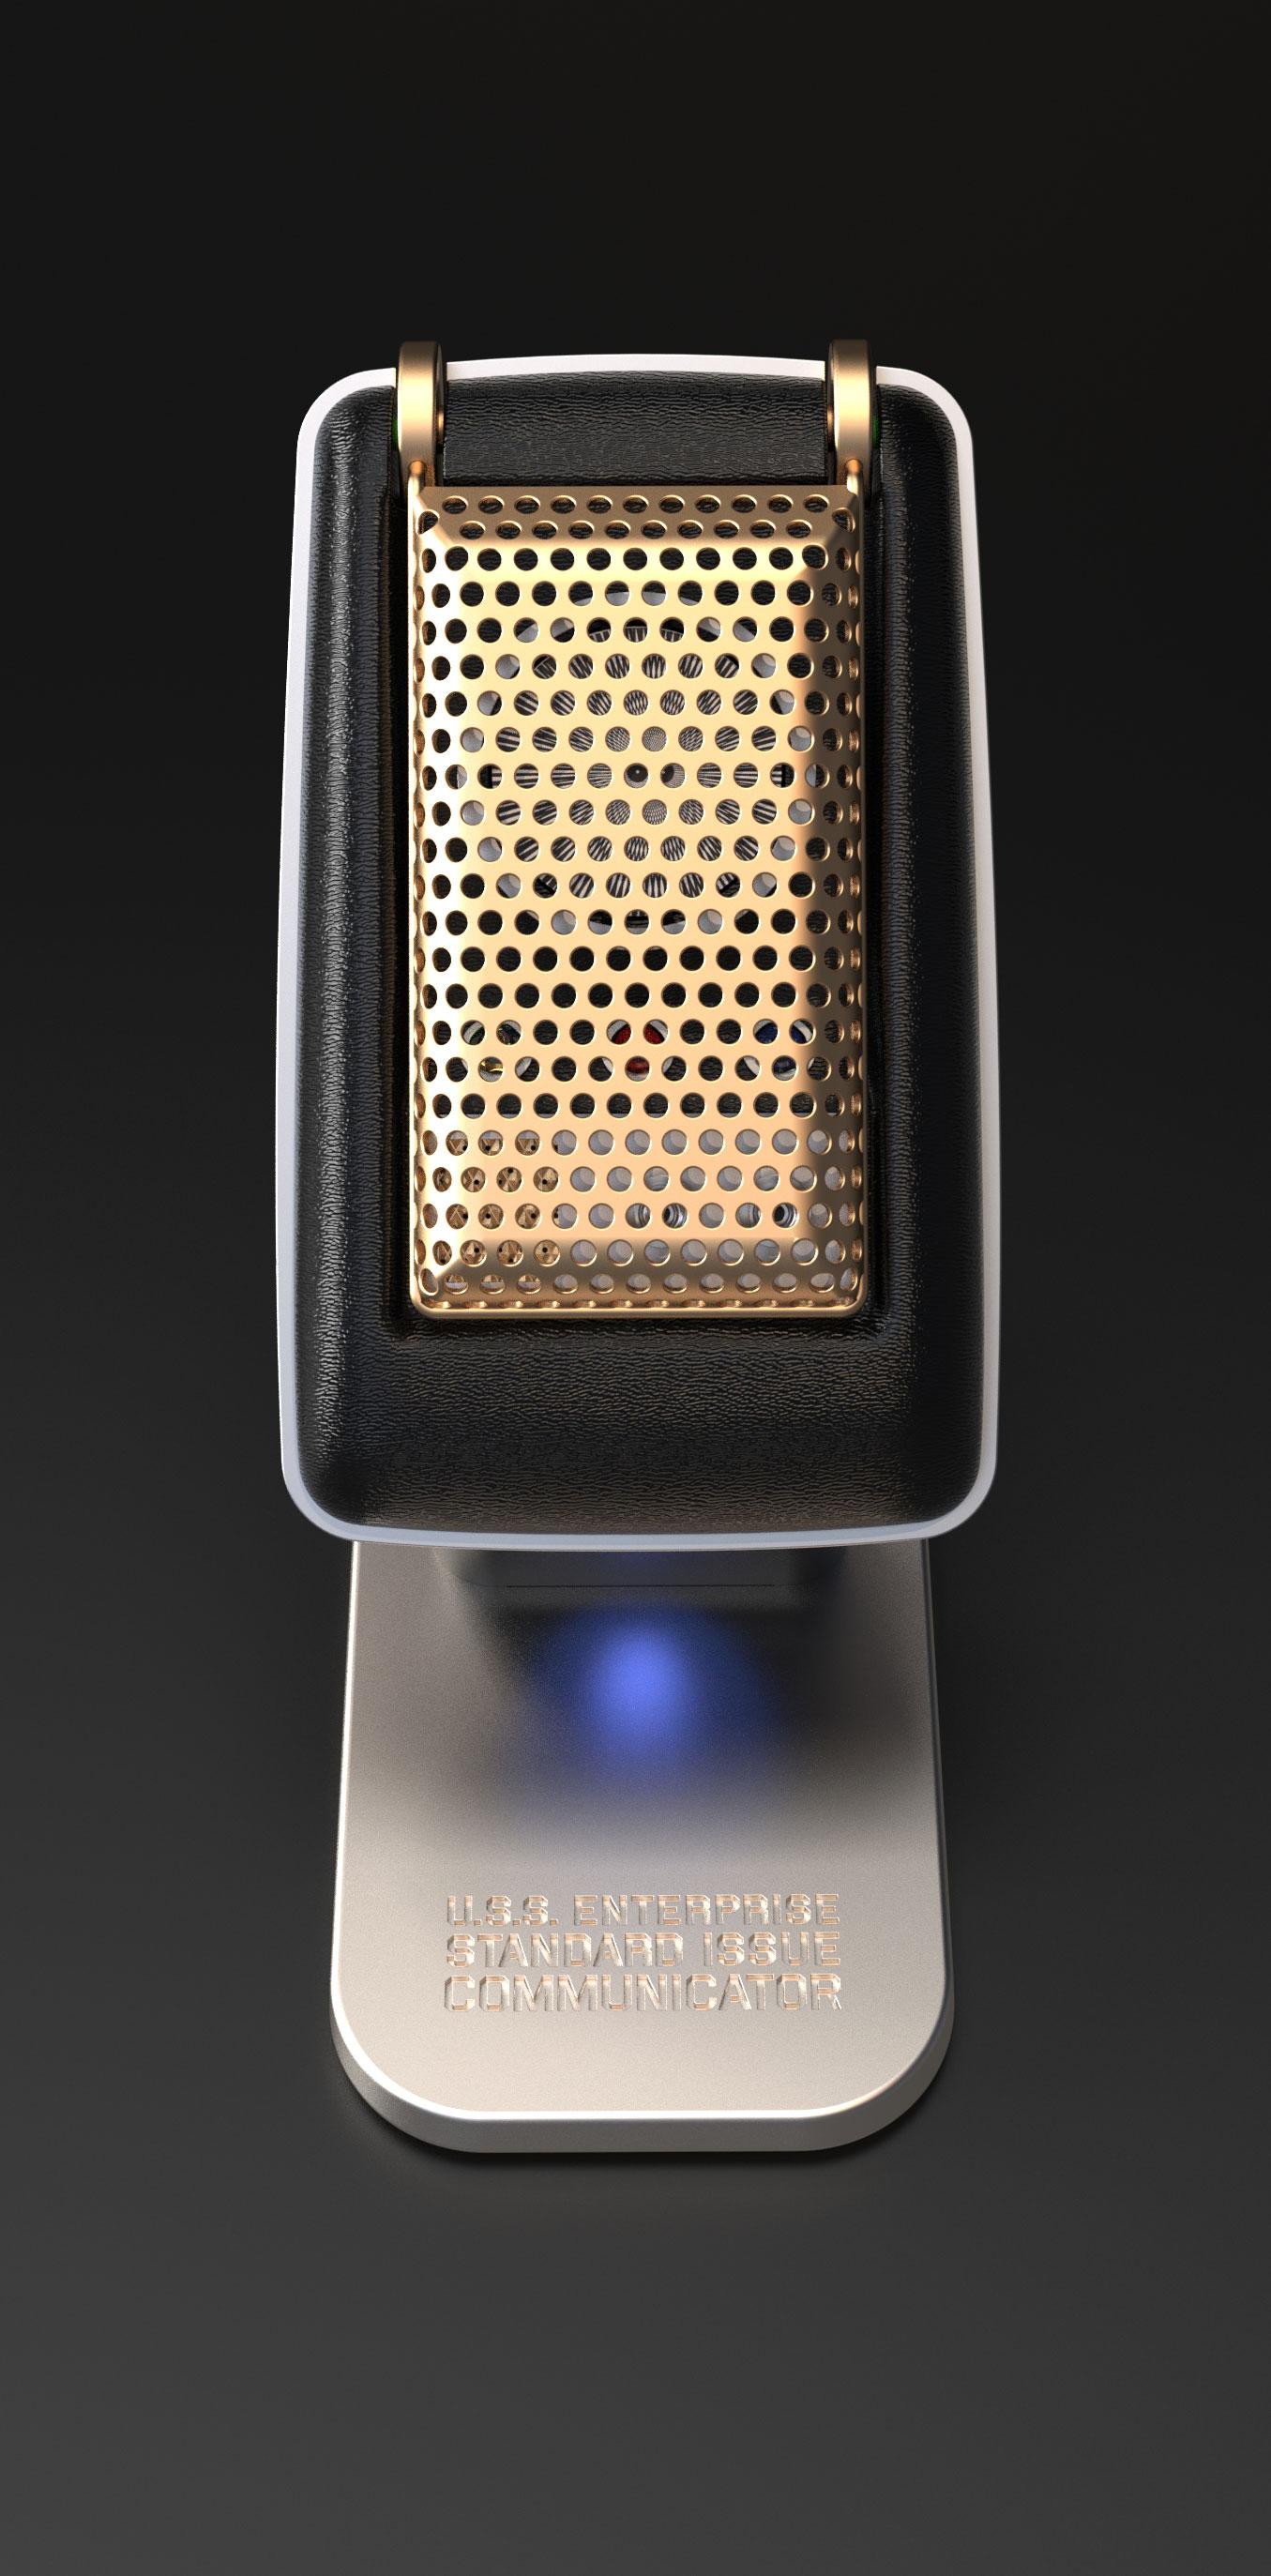 Star Trek Communicator released as Bluetooth handset and ...